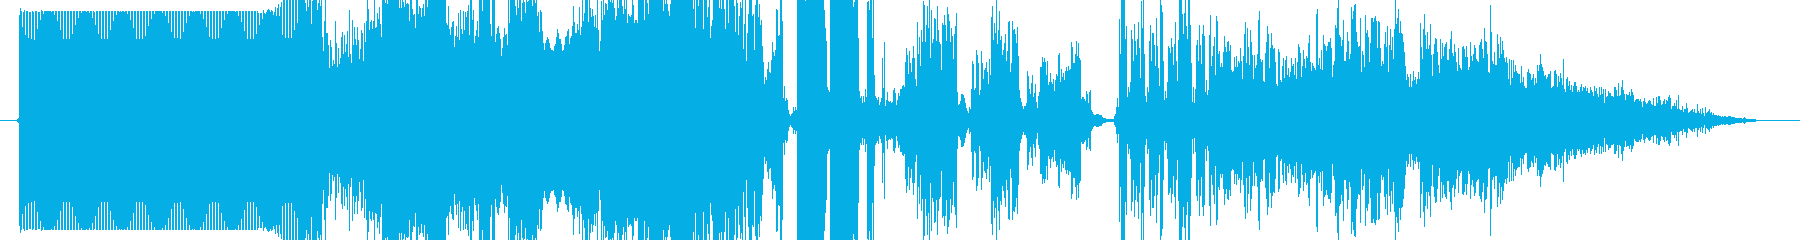 FMジングル制作キット GO!!の再生済みの波形